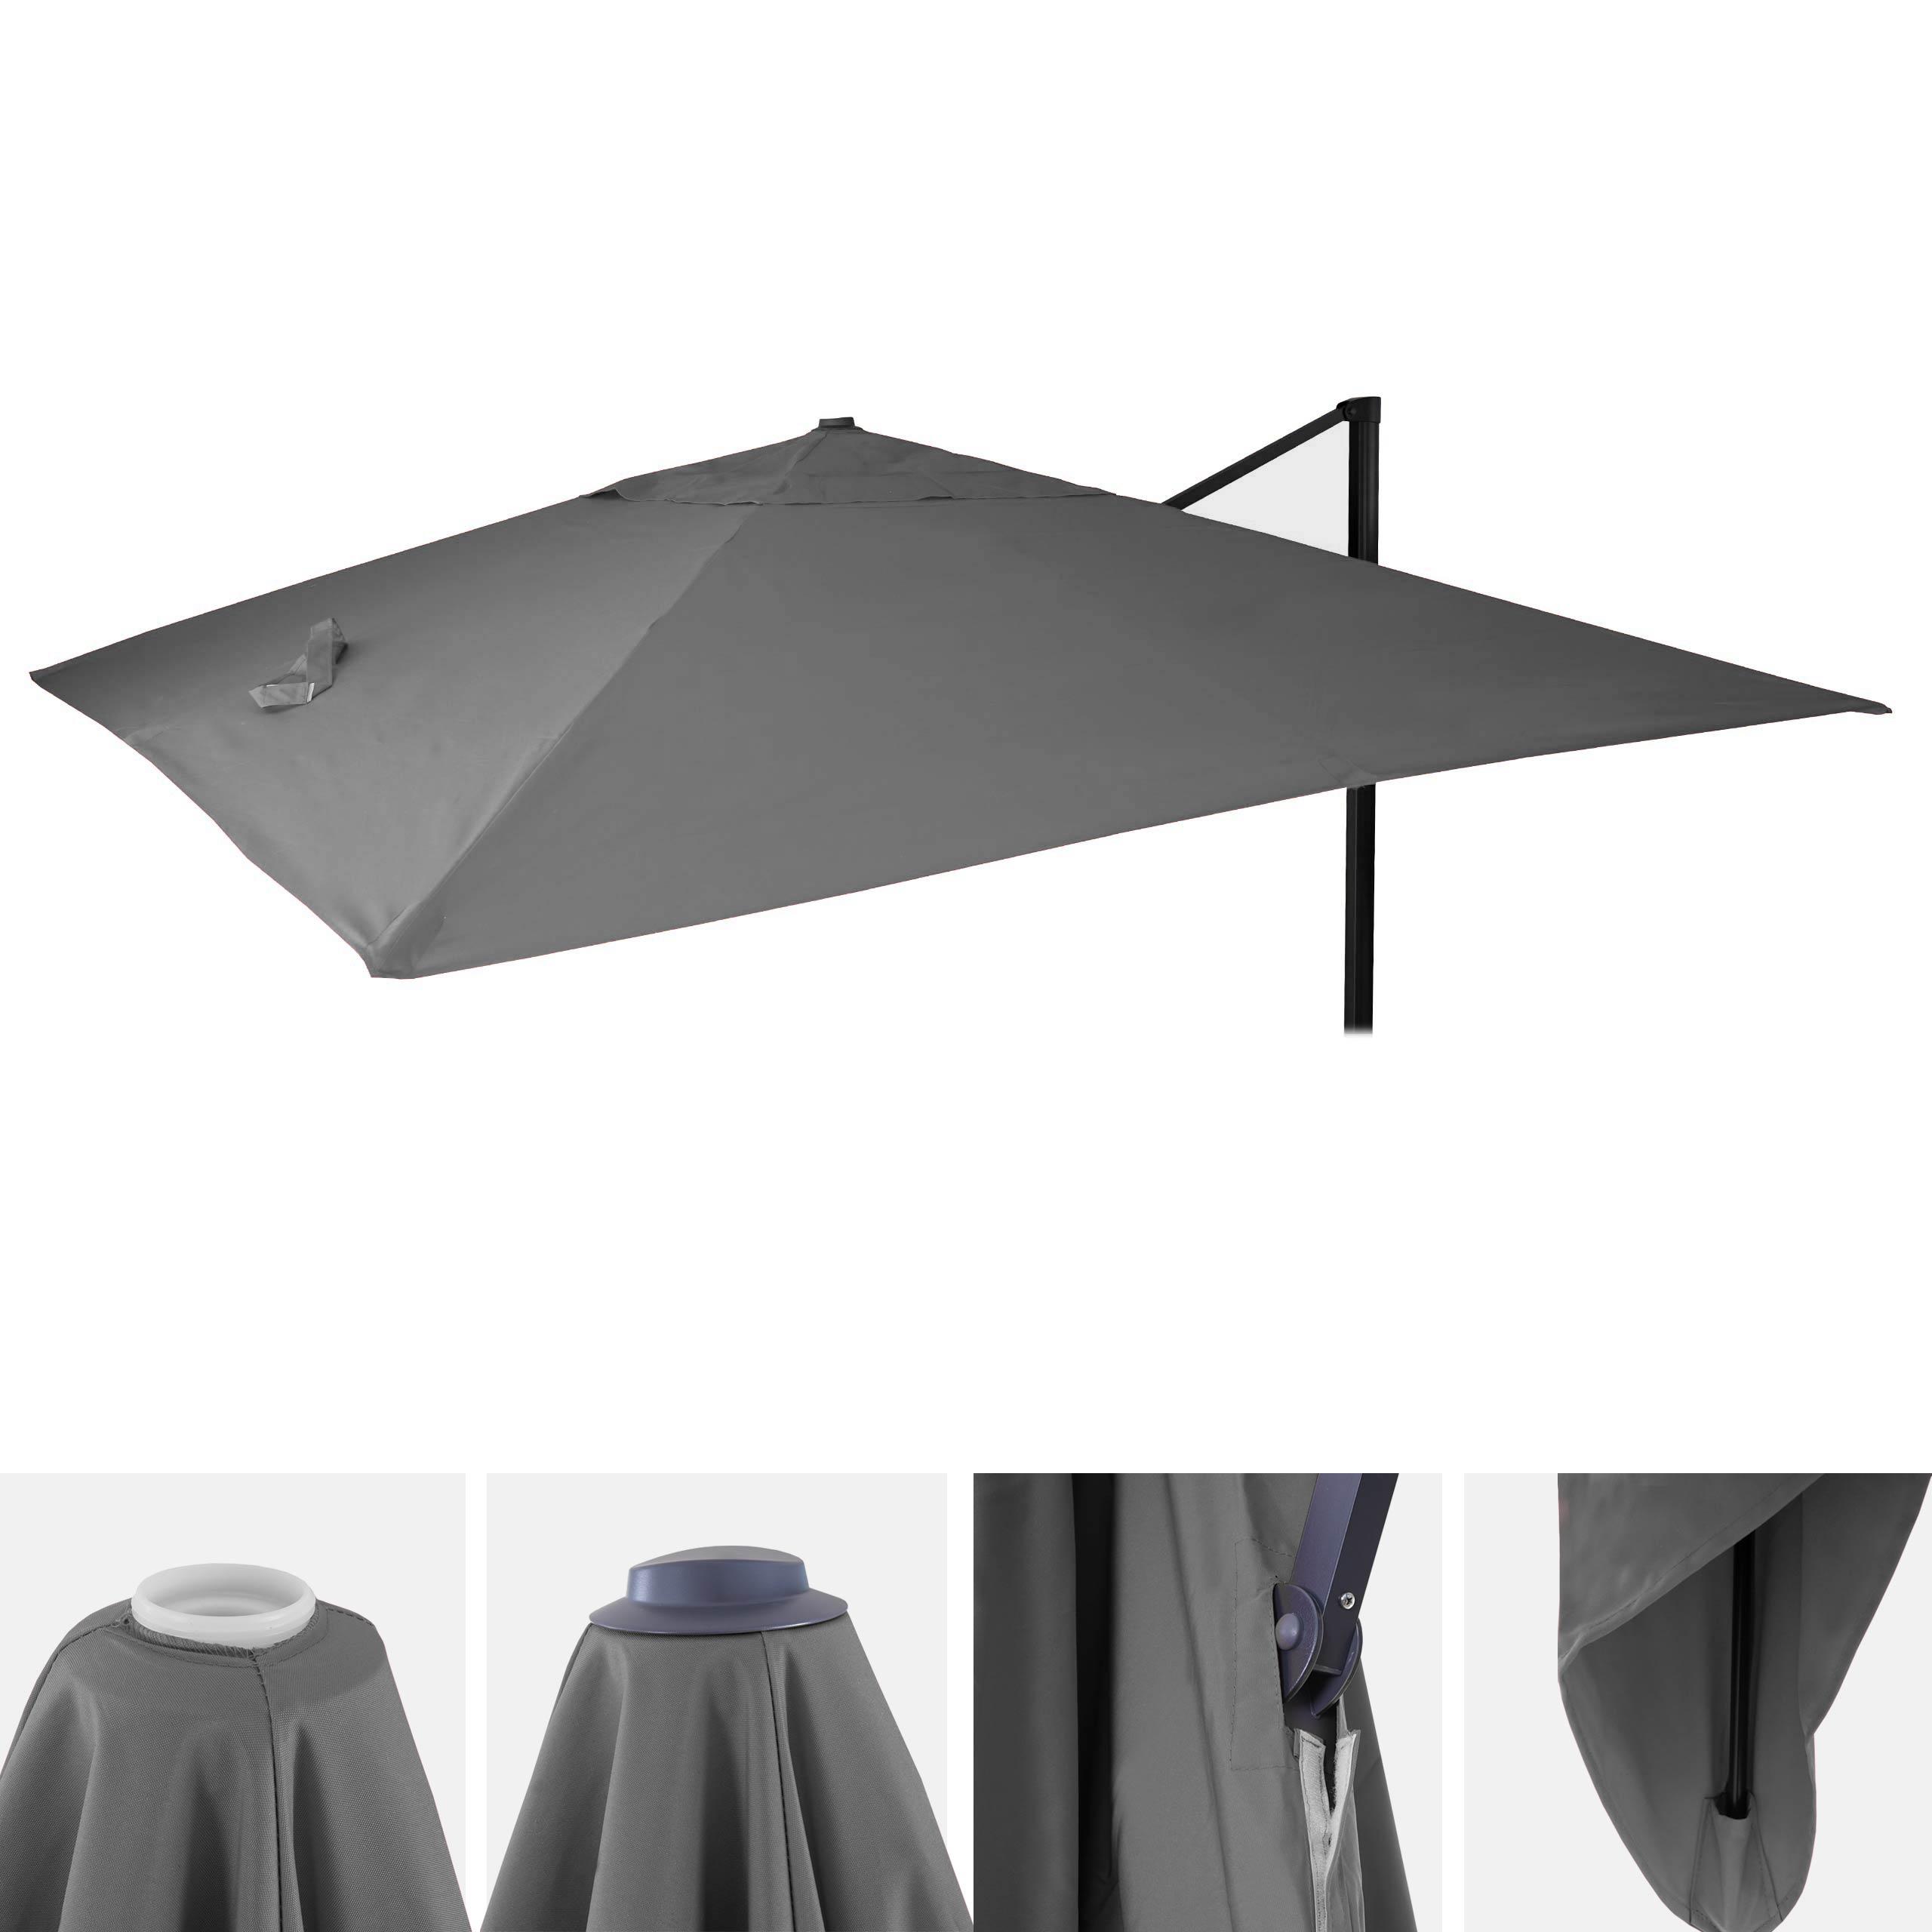 bezug f r luxus ampelschirm hwc a96 sonnenschirmbezug ersatzbezug 3x4m 5m polyester 3 5kg. Black Bedroom Furniture Sets. Home Design Ideas